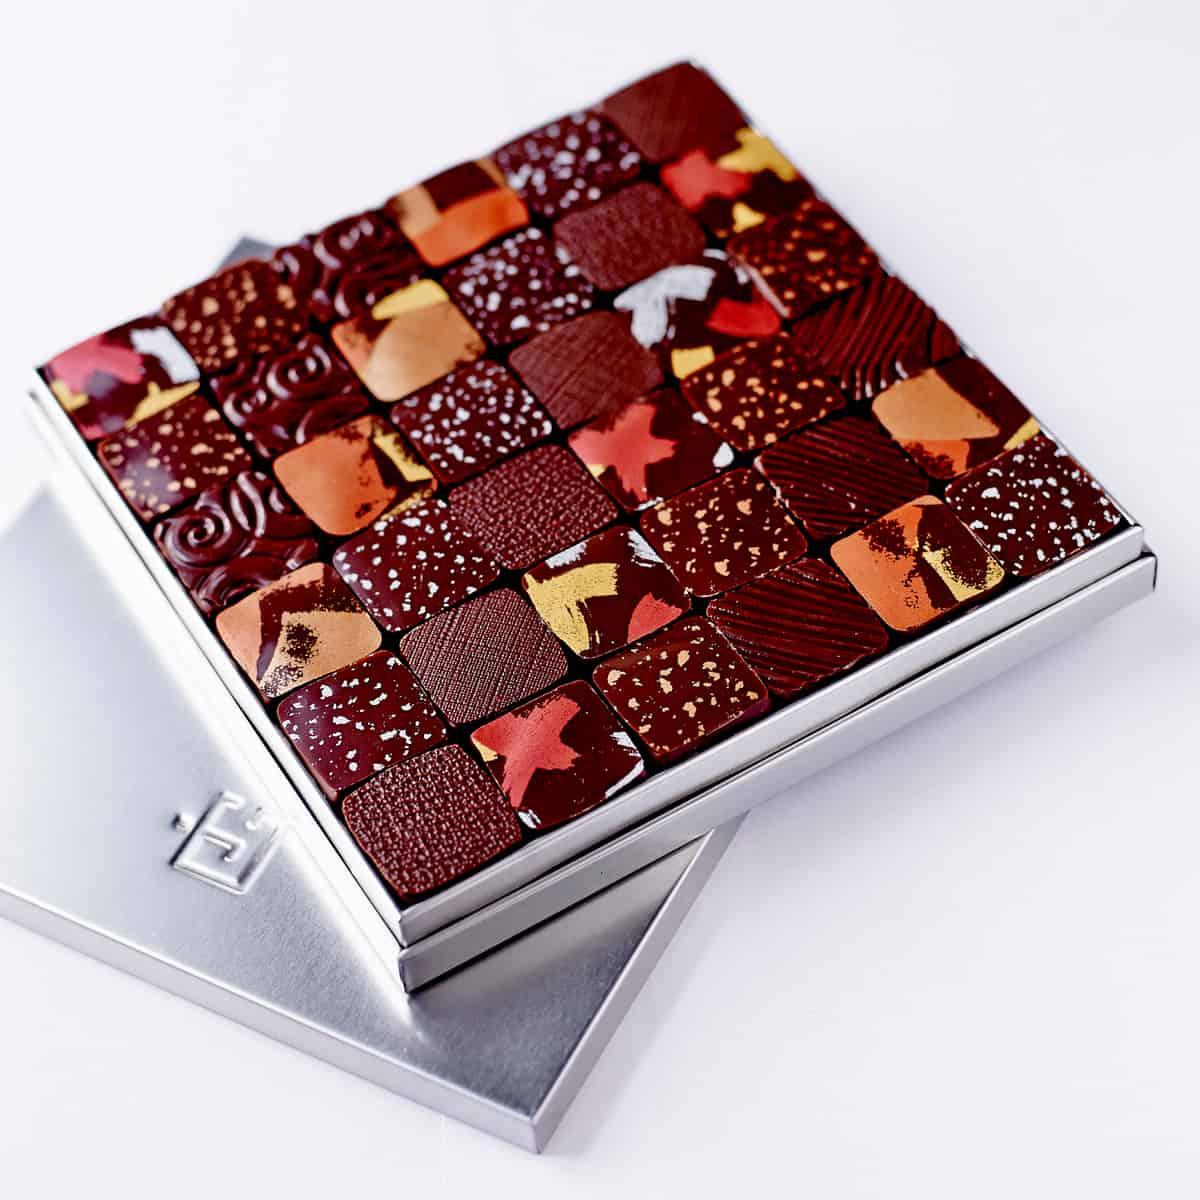 Jacques Genin chocolate